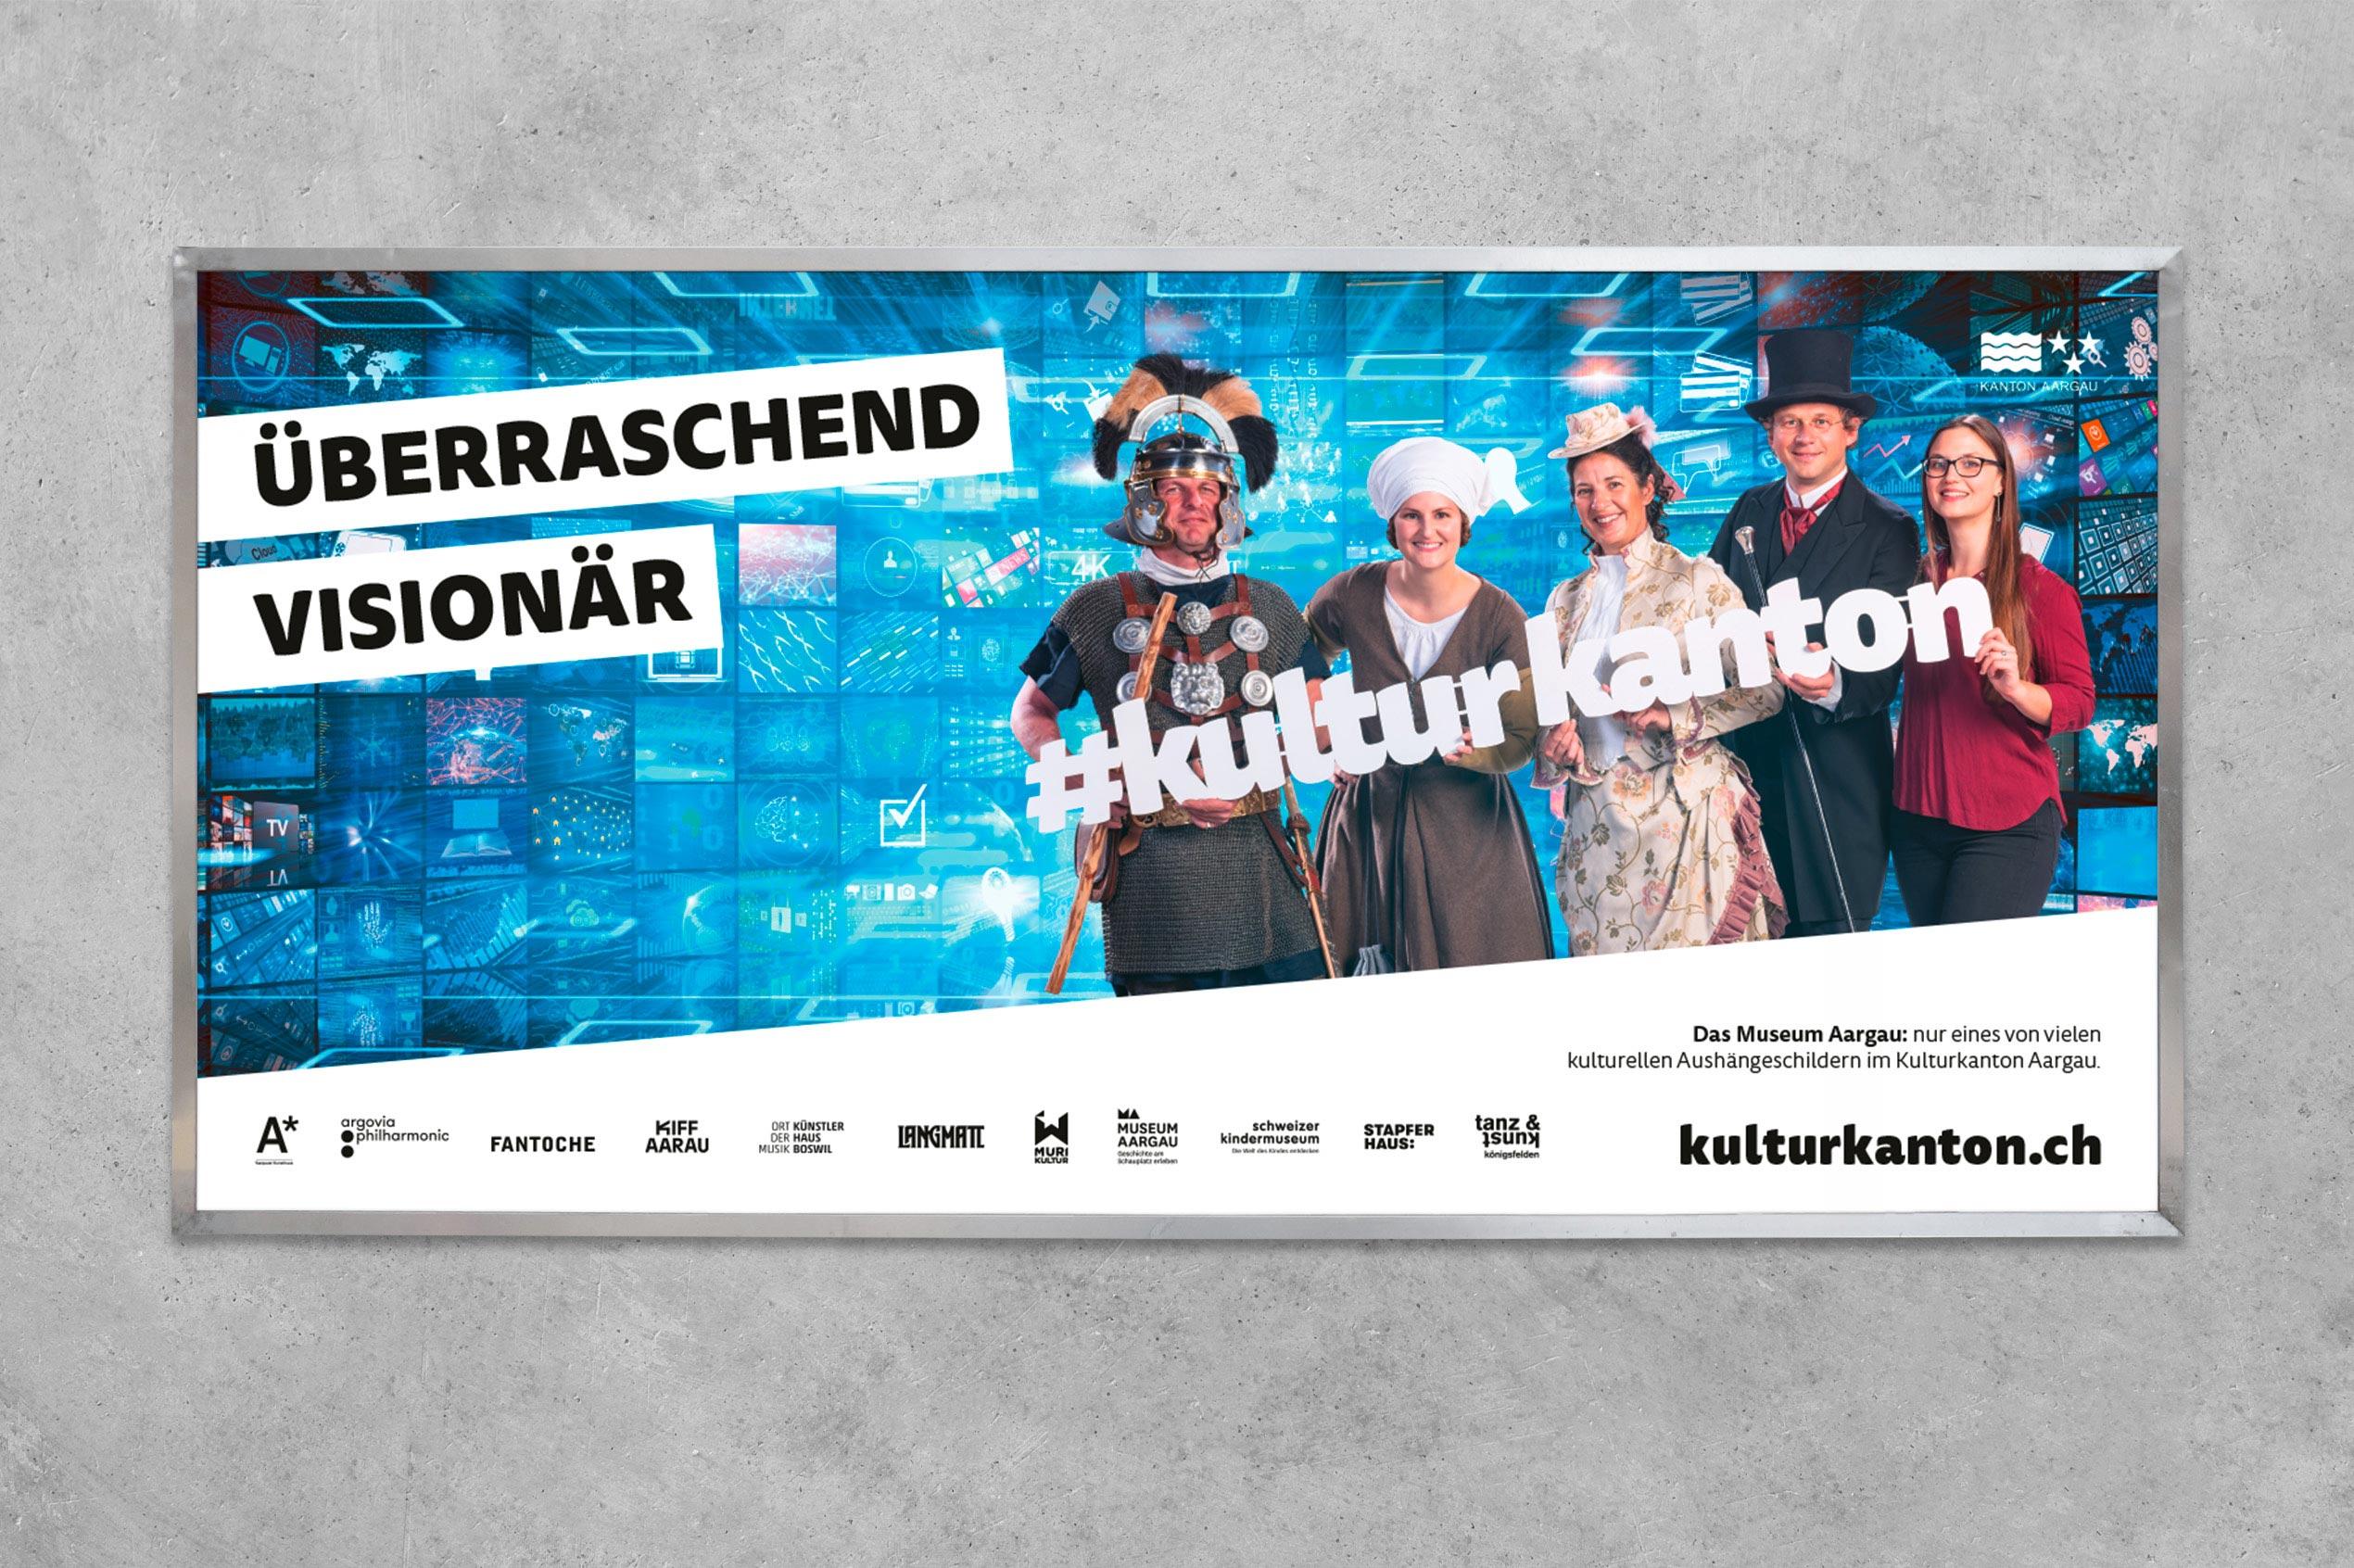 Kulturkanton, Plakat F12, Museum Aargau